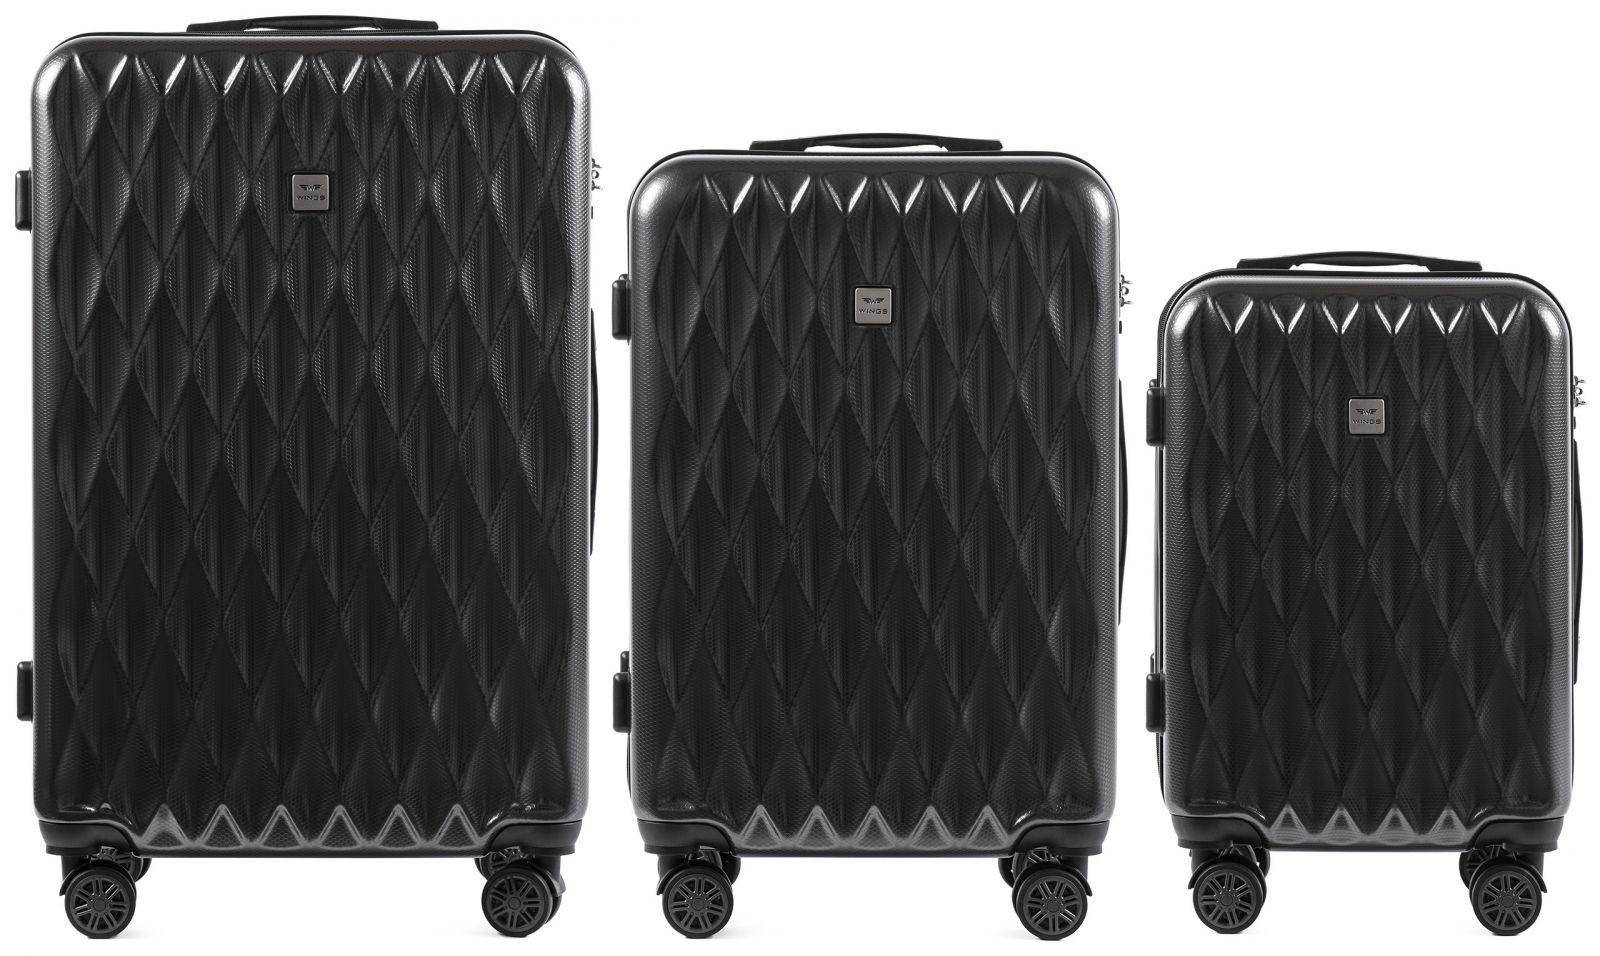 Cestovní kufry sada WINGS ABS- PC